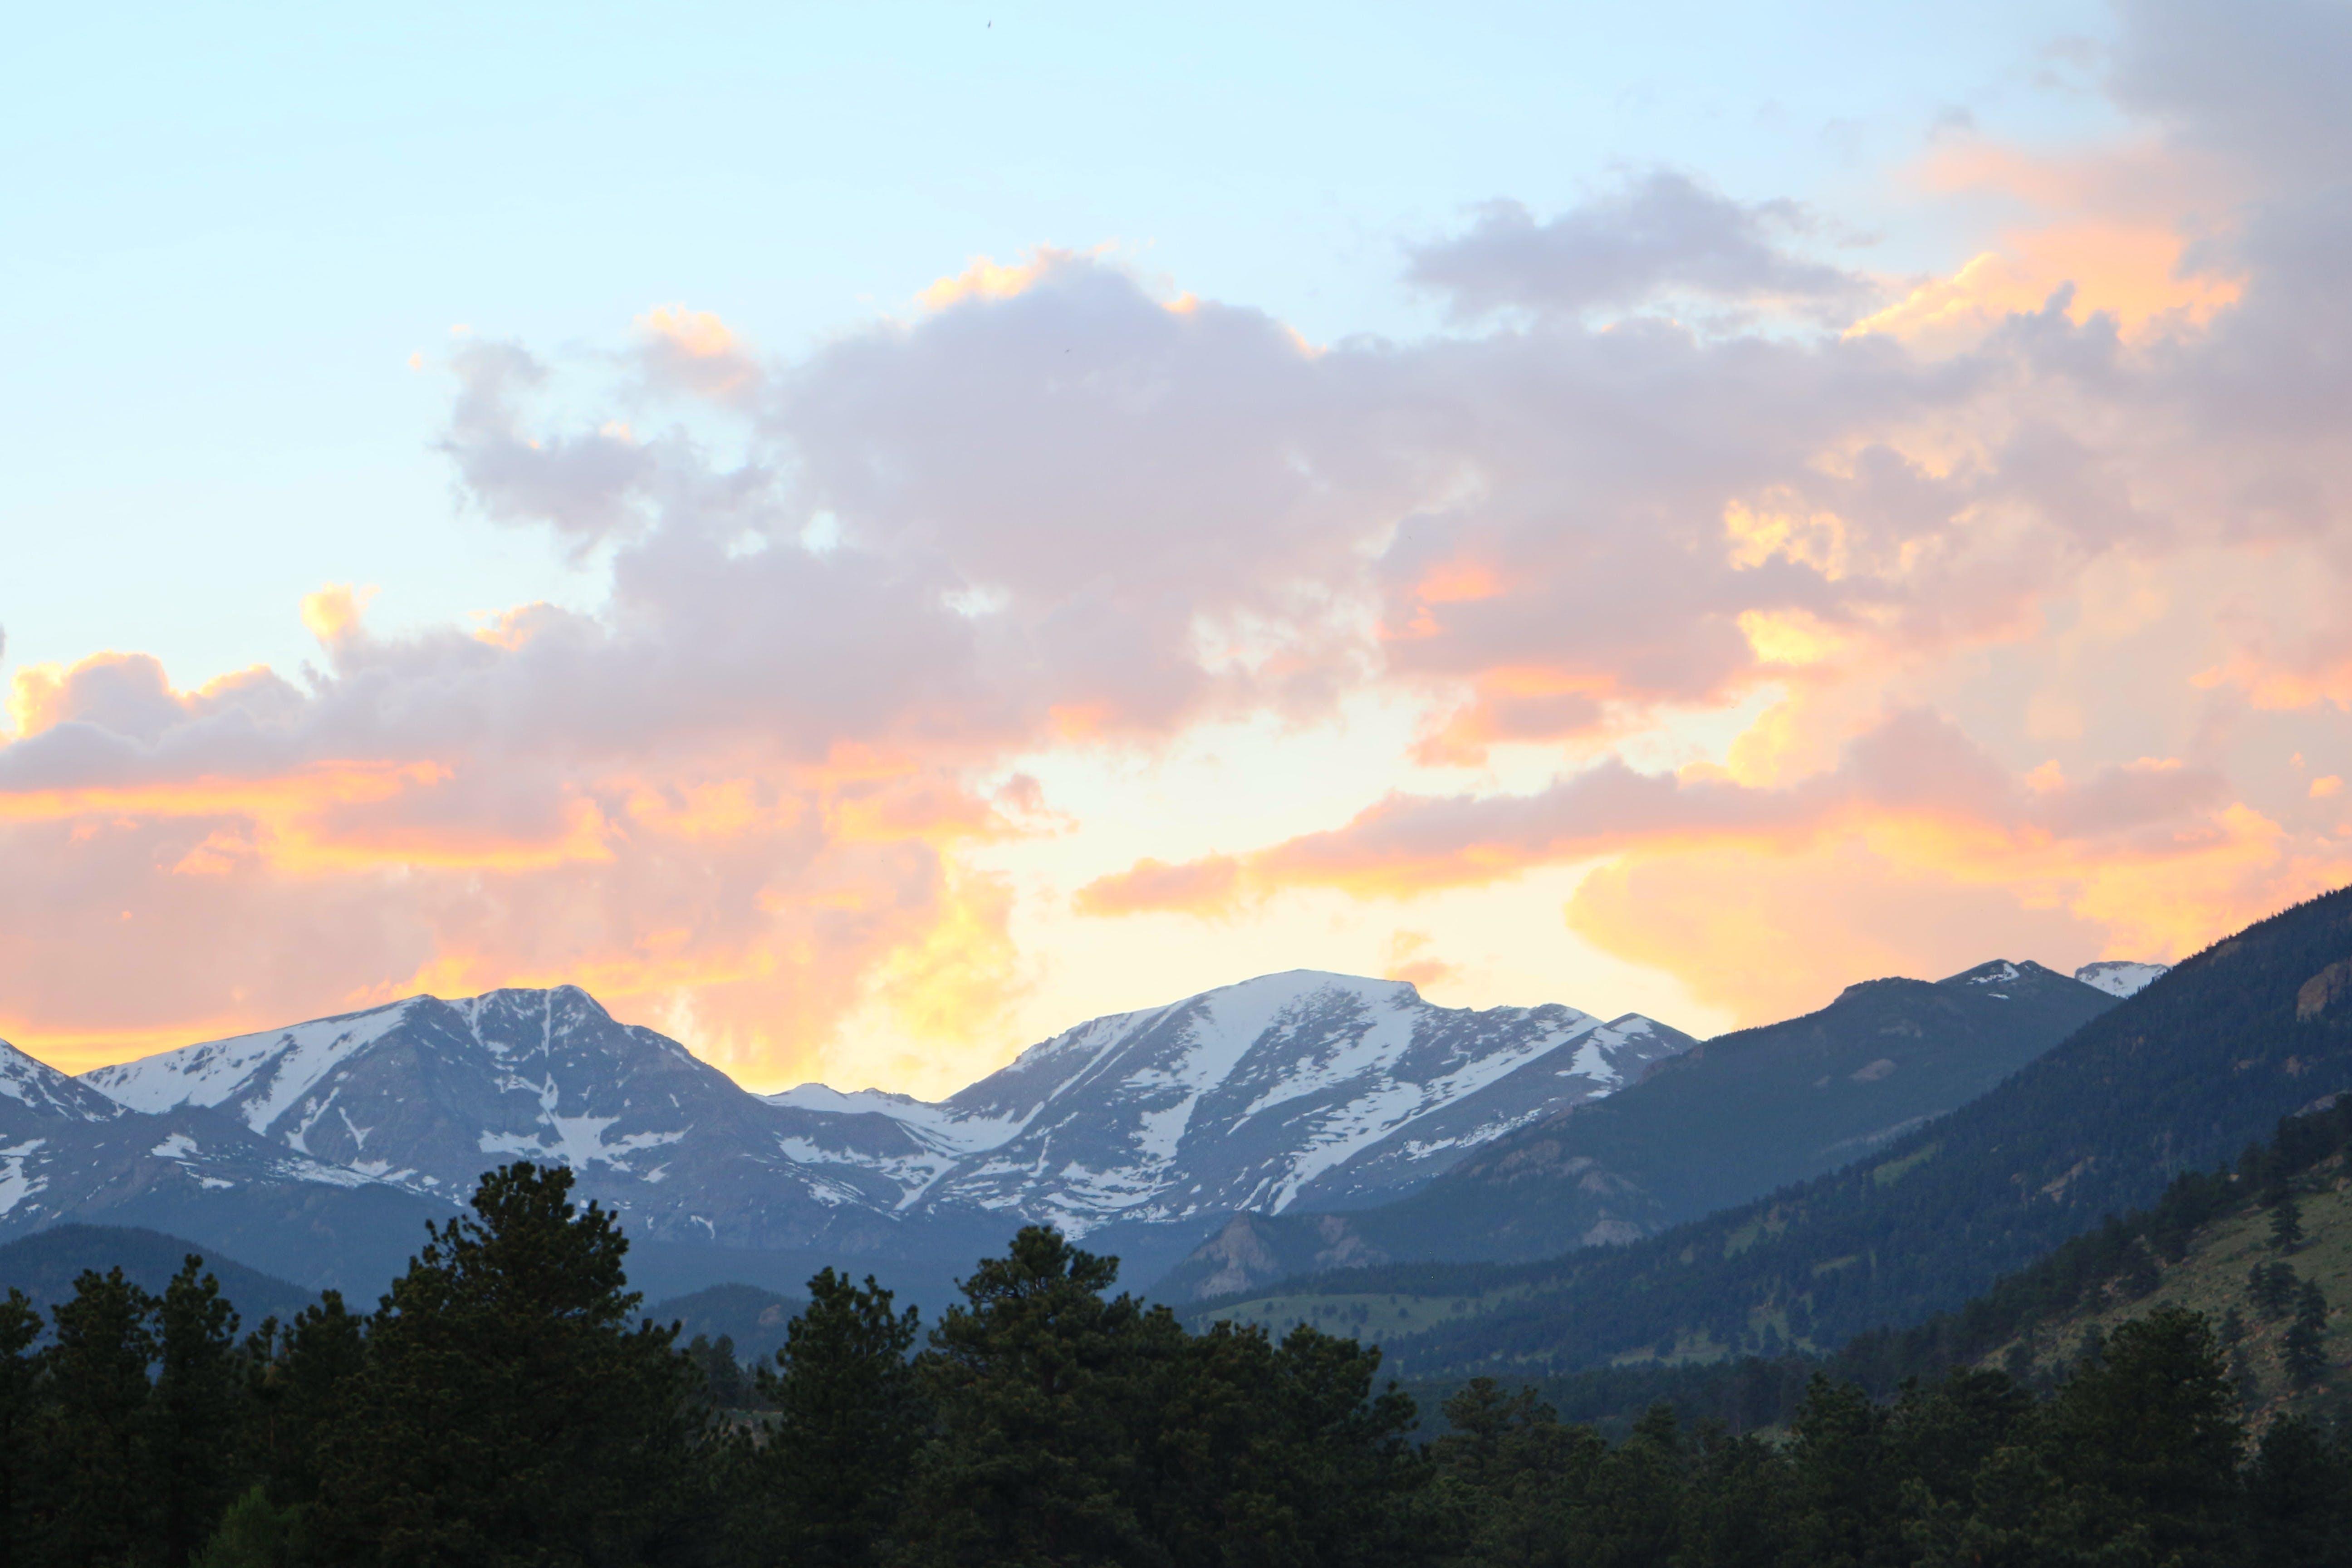 colorado, rocky mountain, sunset